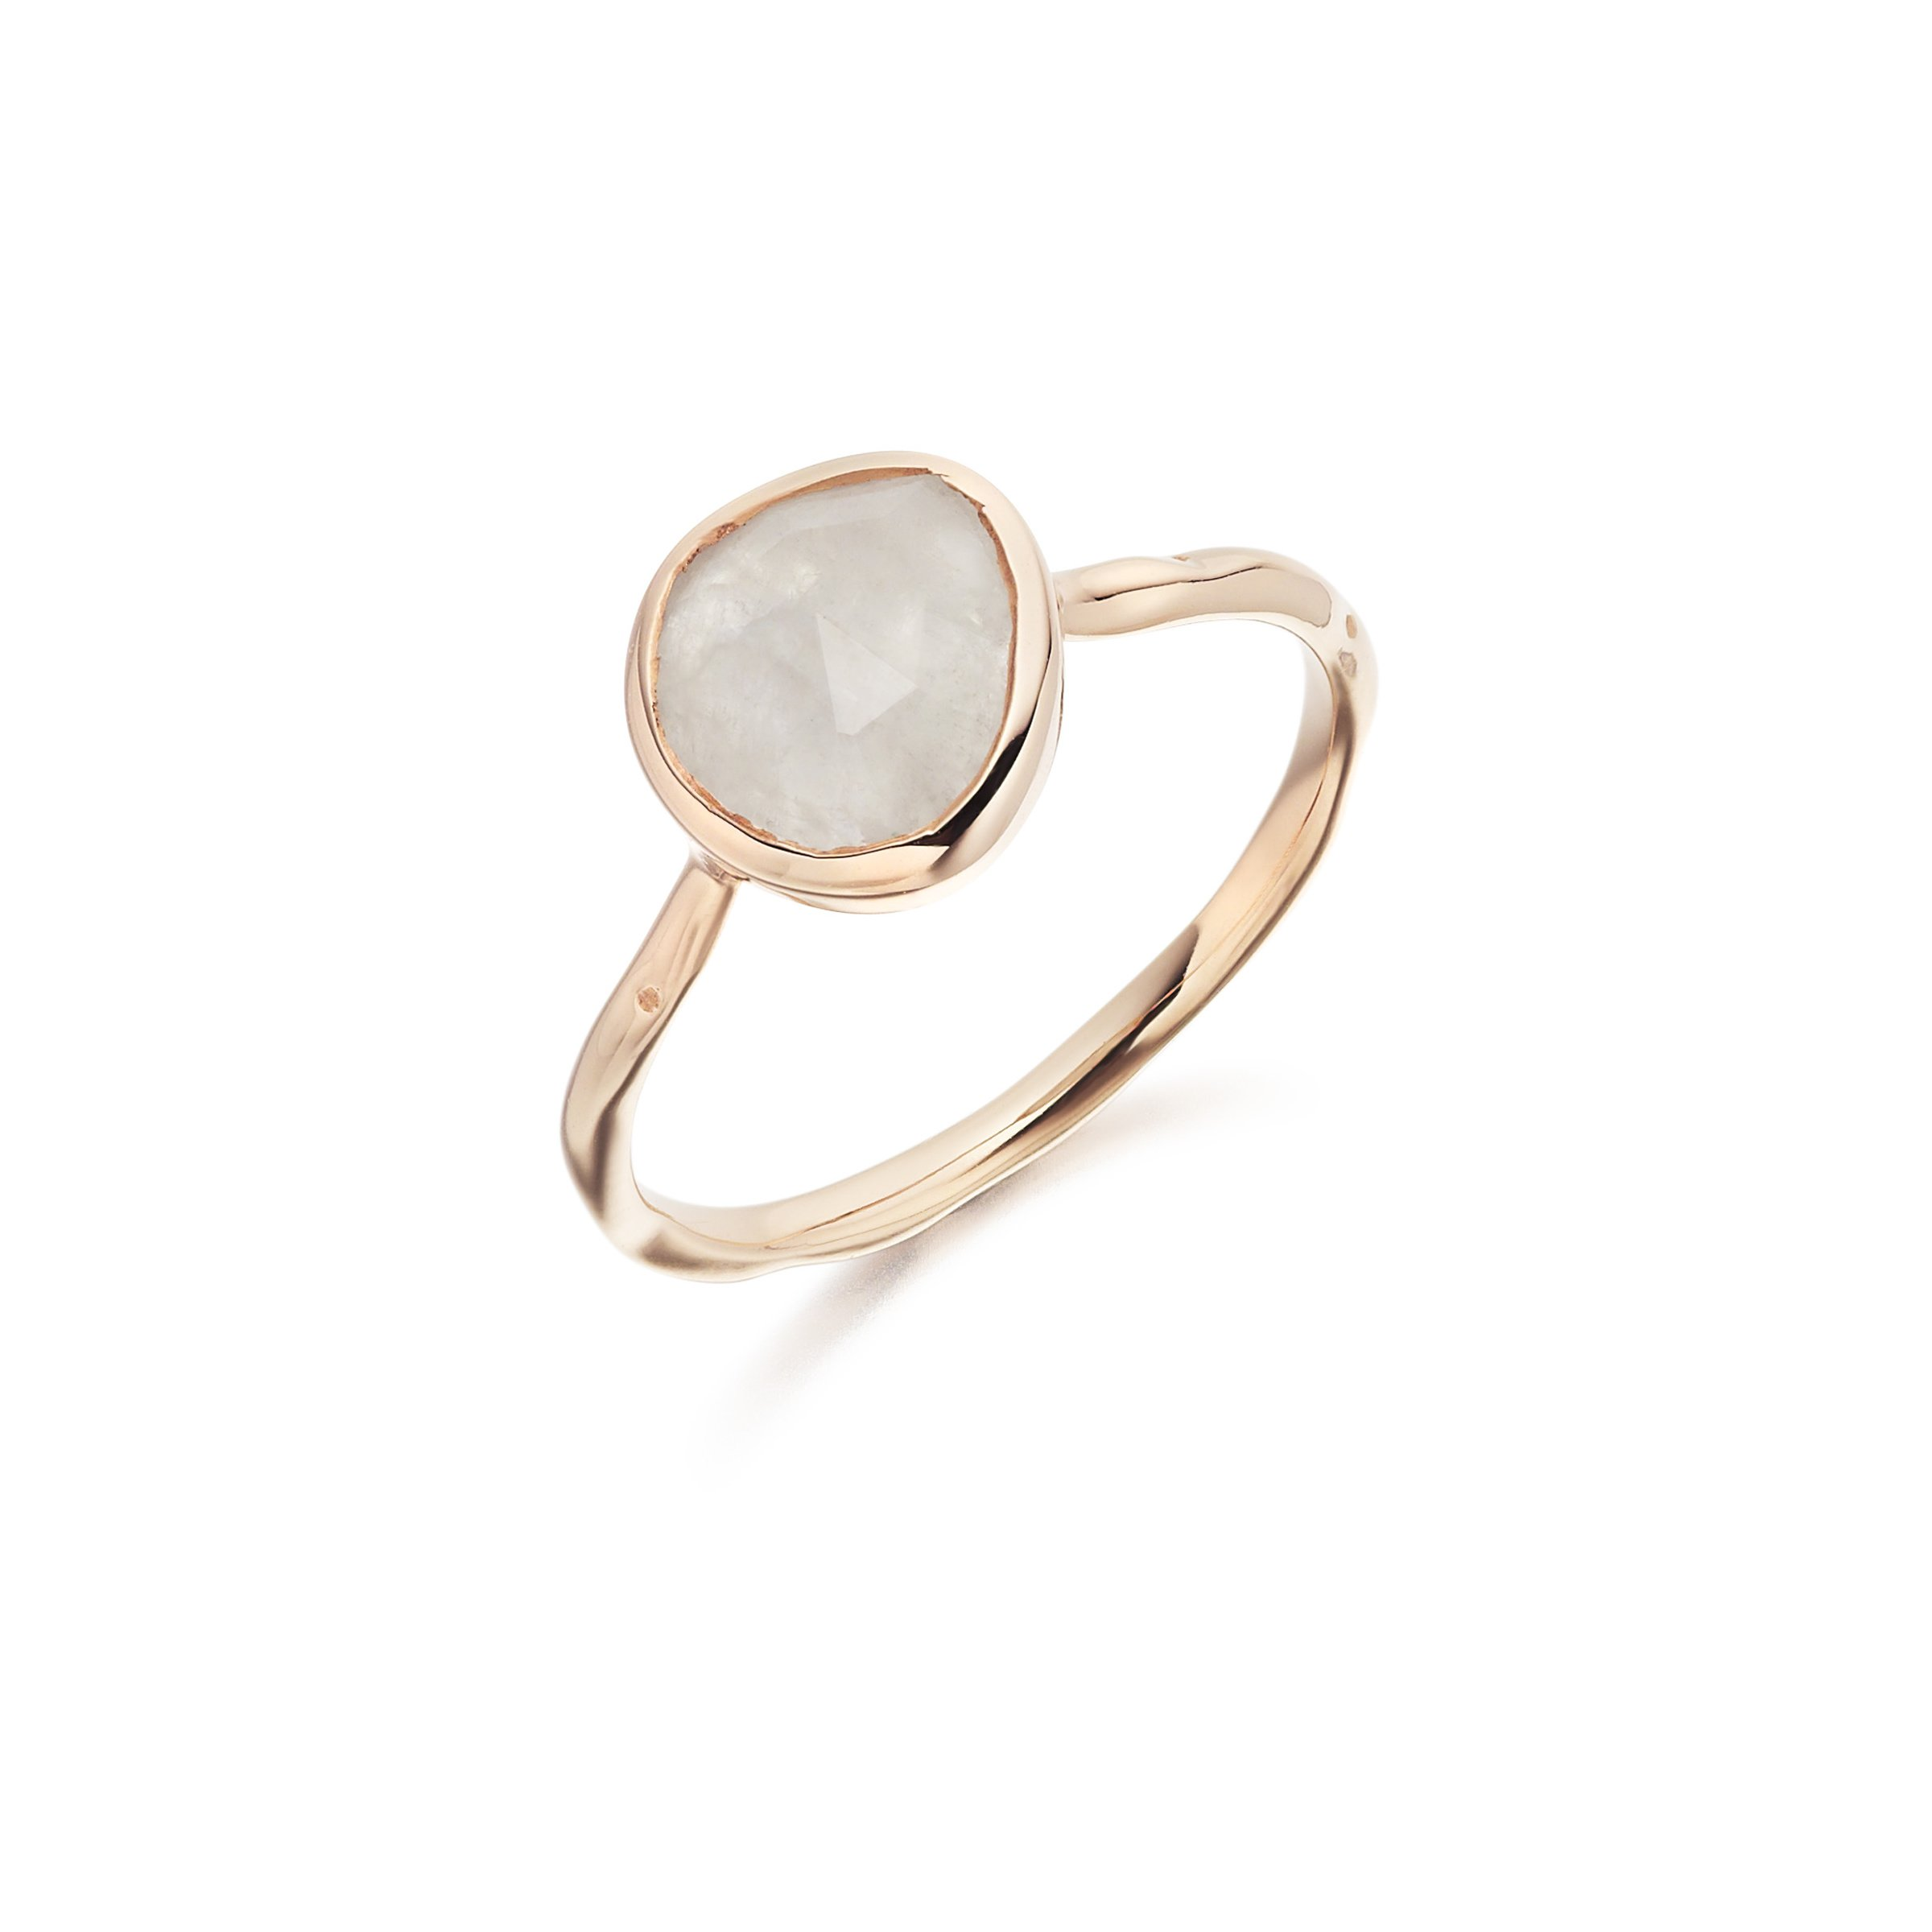 Moonstone Engagement Ring, Monica Vinader